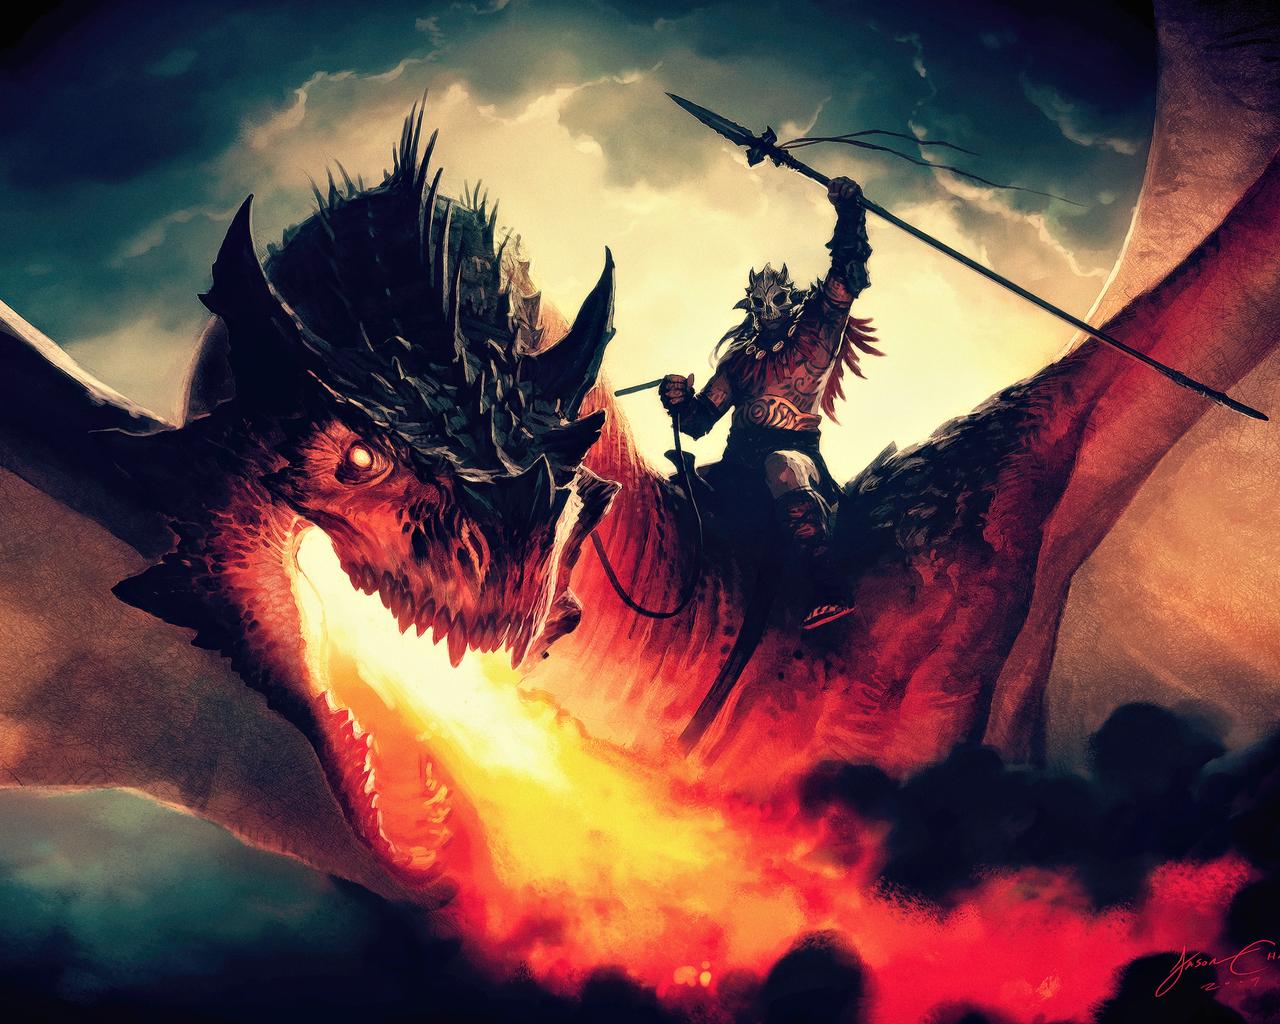 magic-the-gathering-arena-dragon-concept-art-8x.jpg